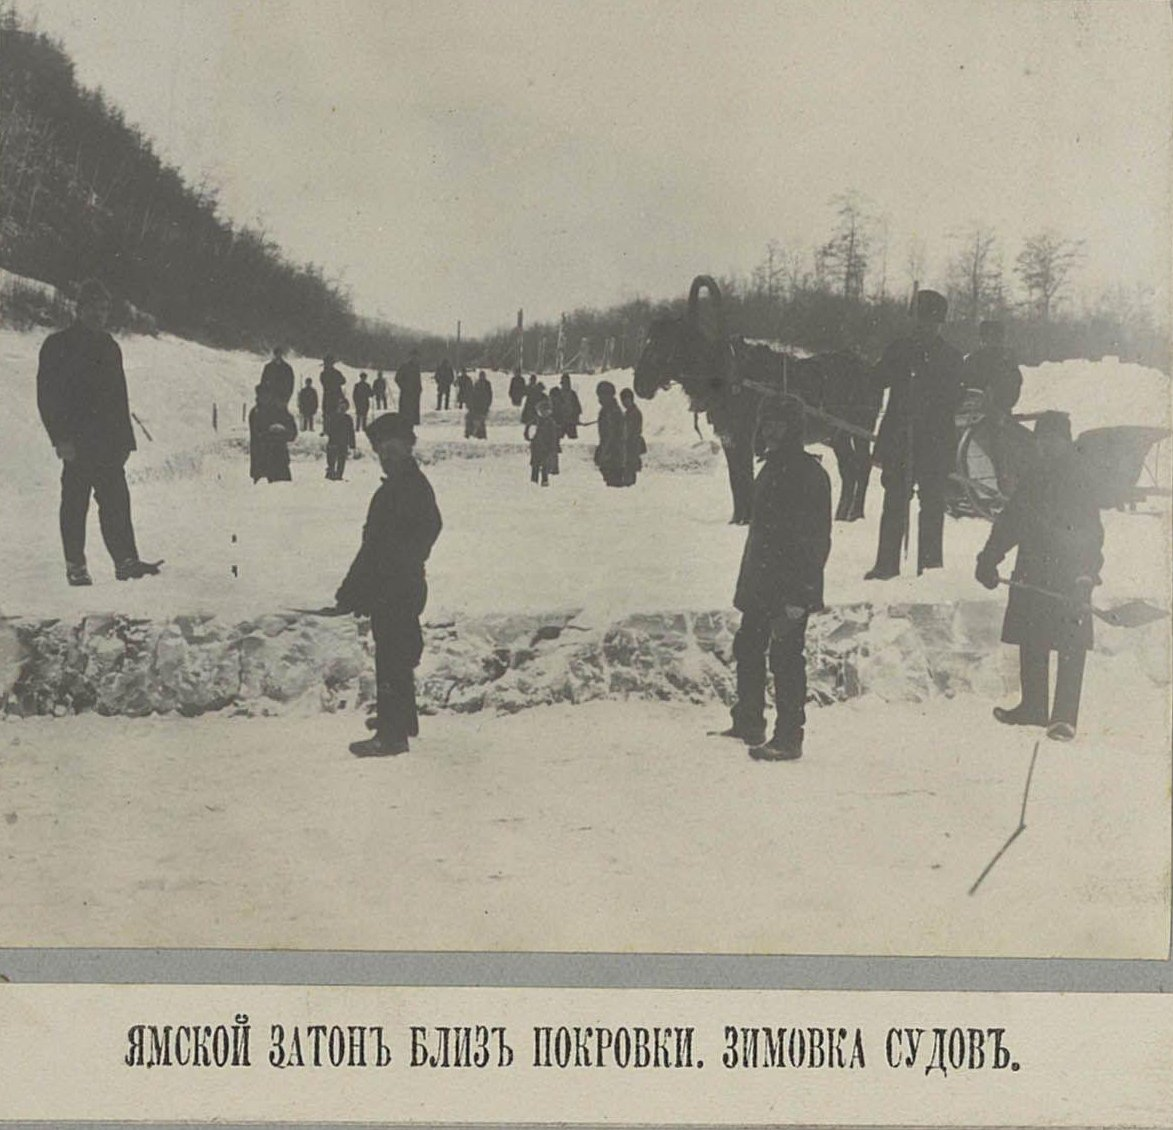 171. Ямской затон близ Покровки. Зимовка судов